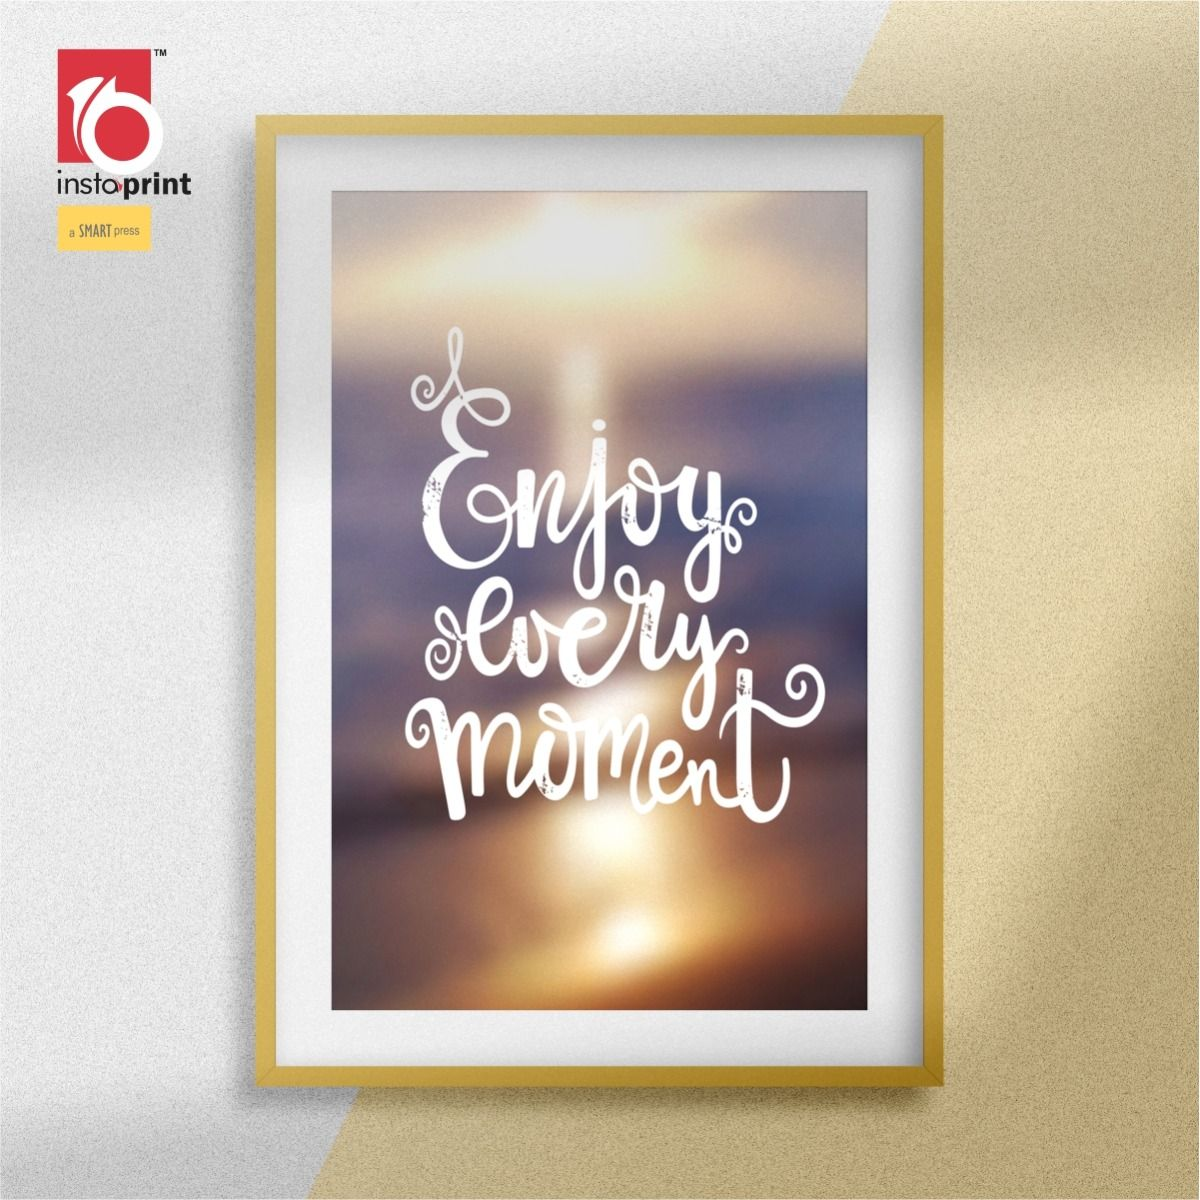 Insta Print All Frames